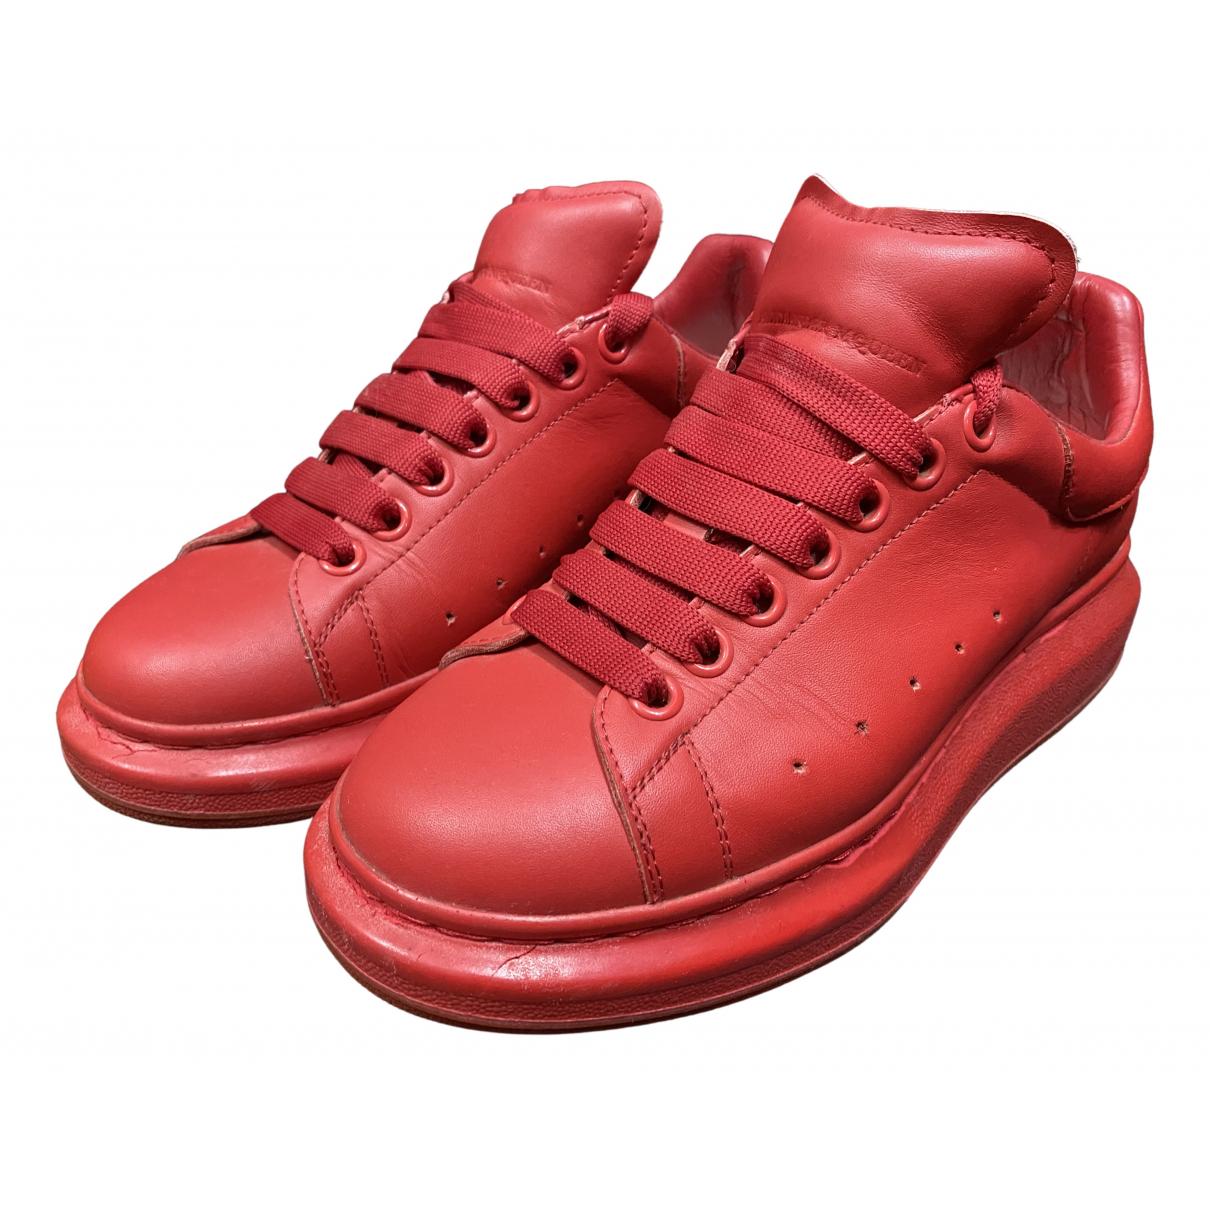 Alexander Mcqueen - Baskets Oversize pour homme en cuir - rouge